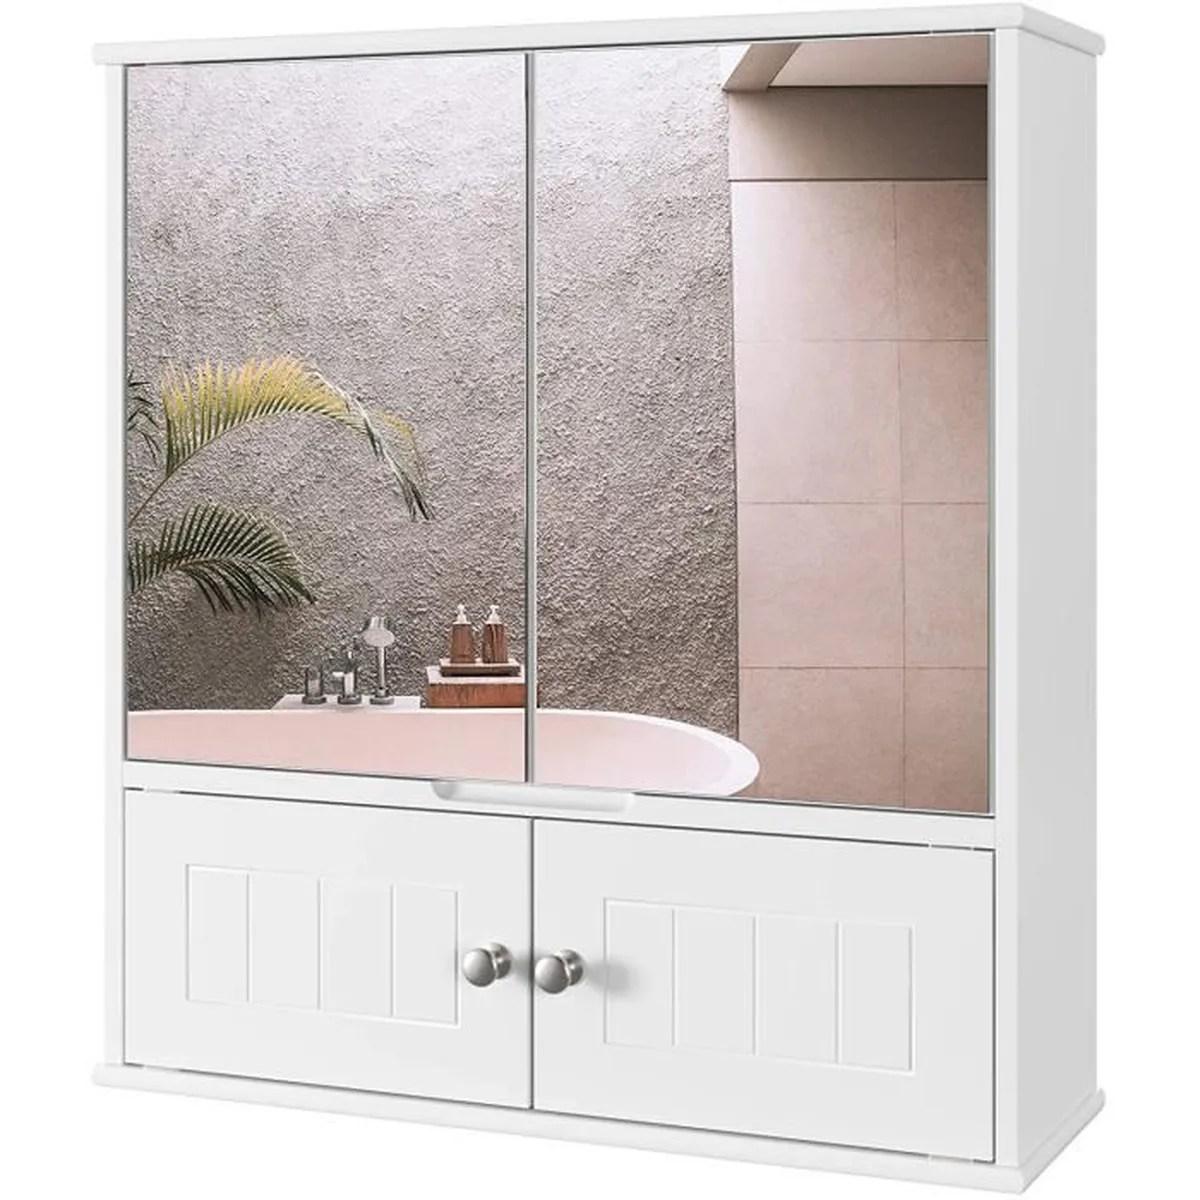 Miroir De Salle De Bain Homecho Blanc Avec 2 Portes A Miroir Hd Armoire Murale Avec Miroir 55 X 17 5 X 60 Cm Achat Vente Miroir